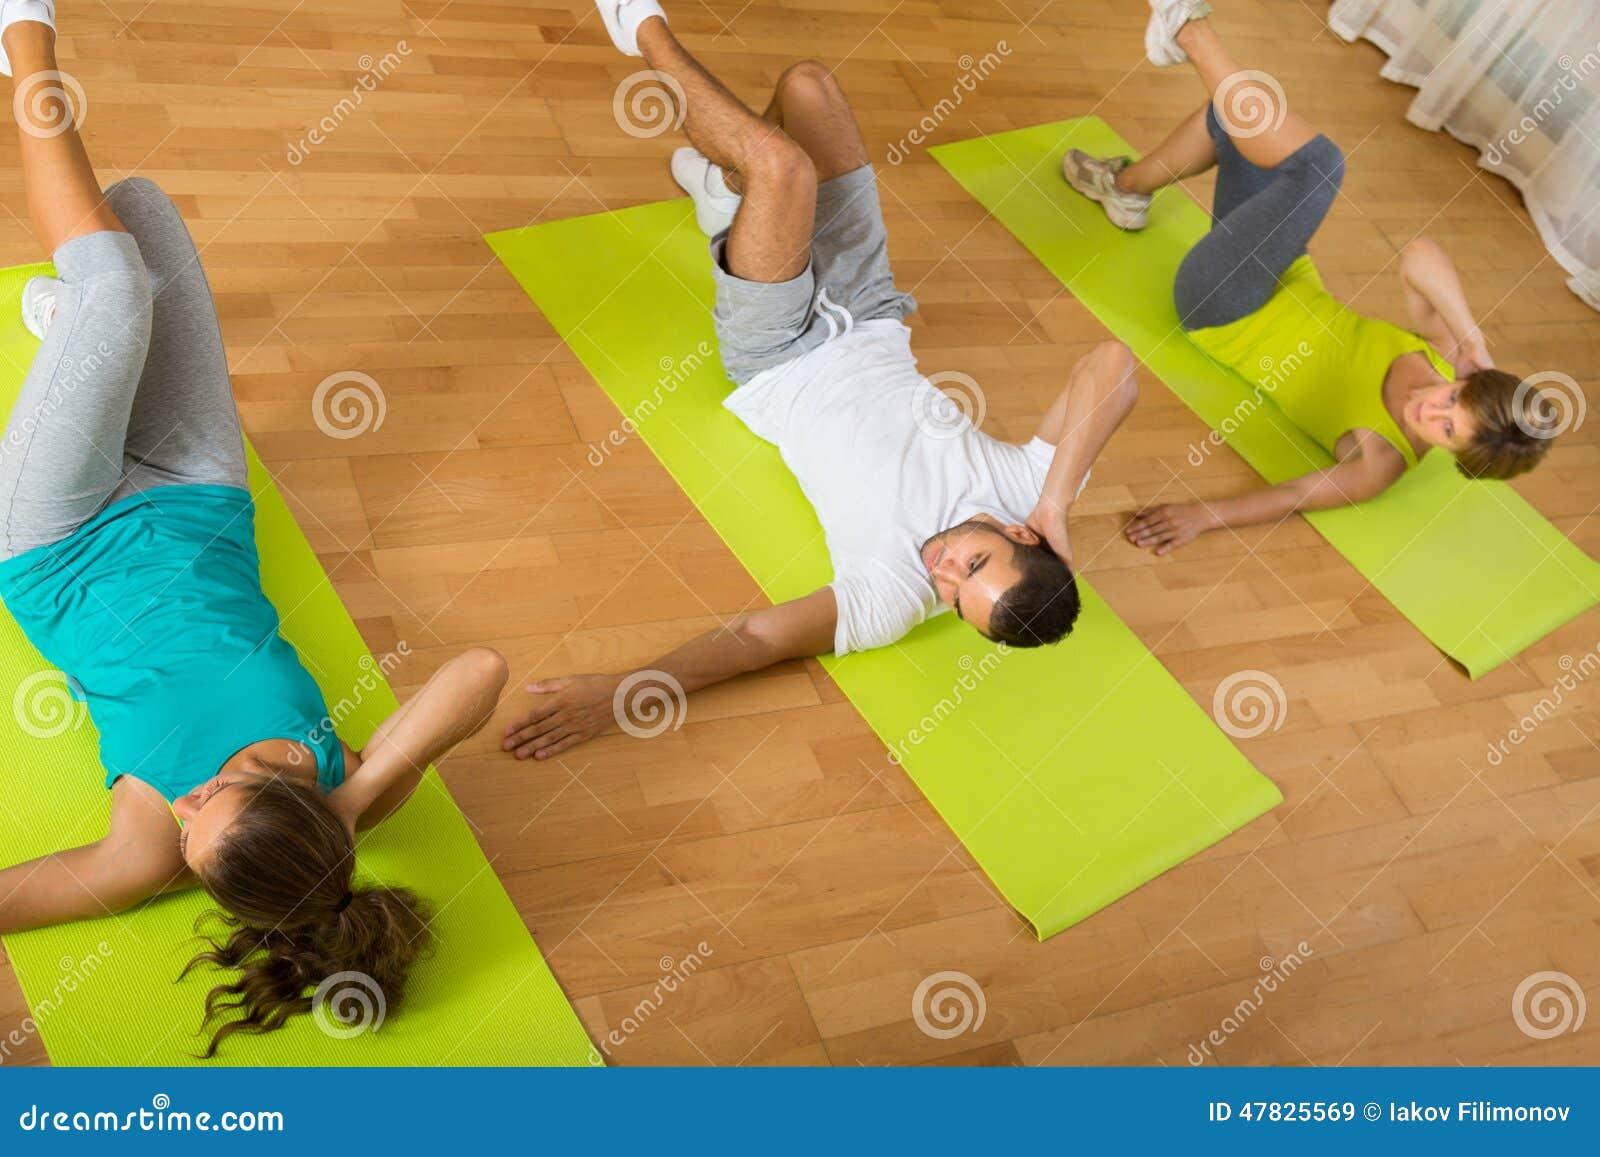 having fitness